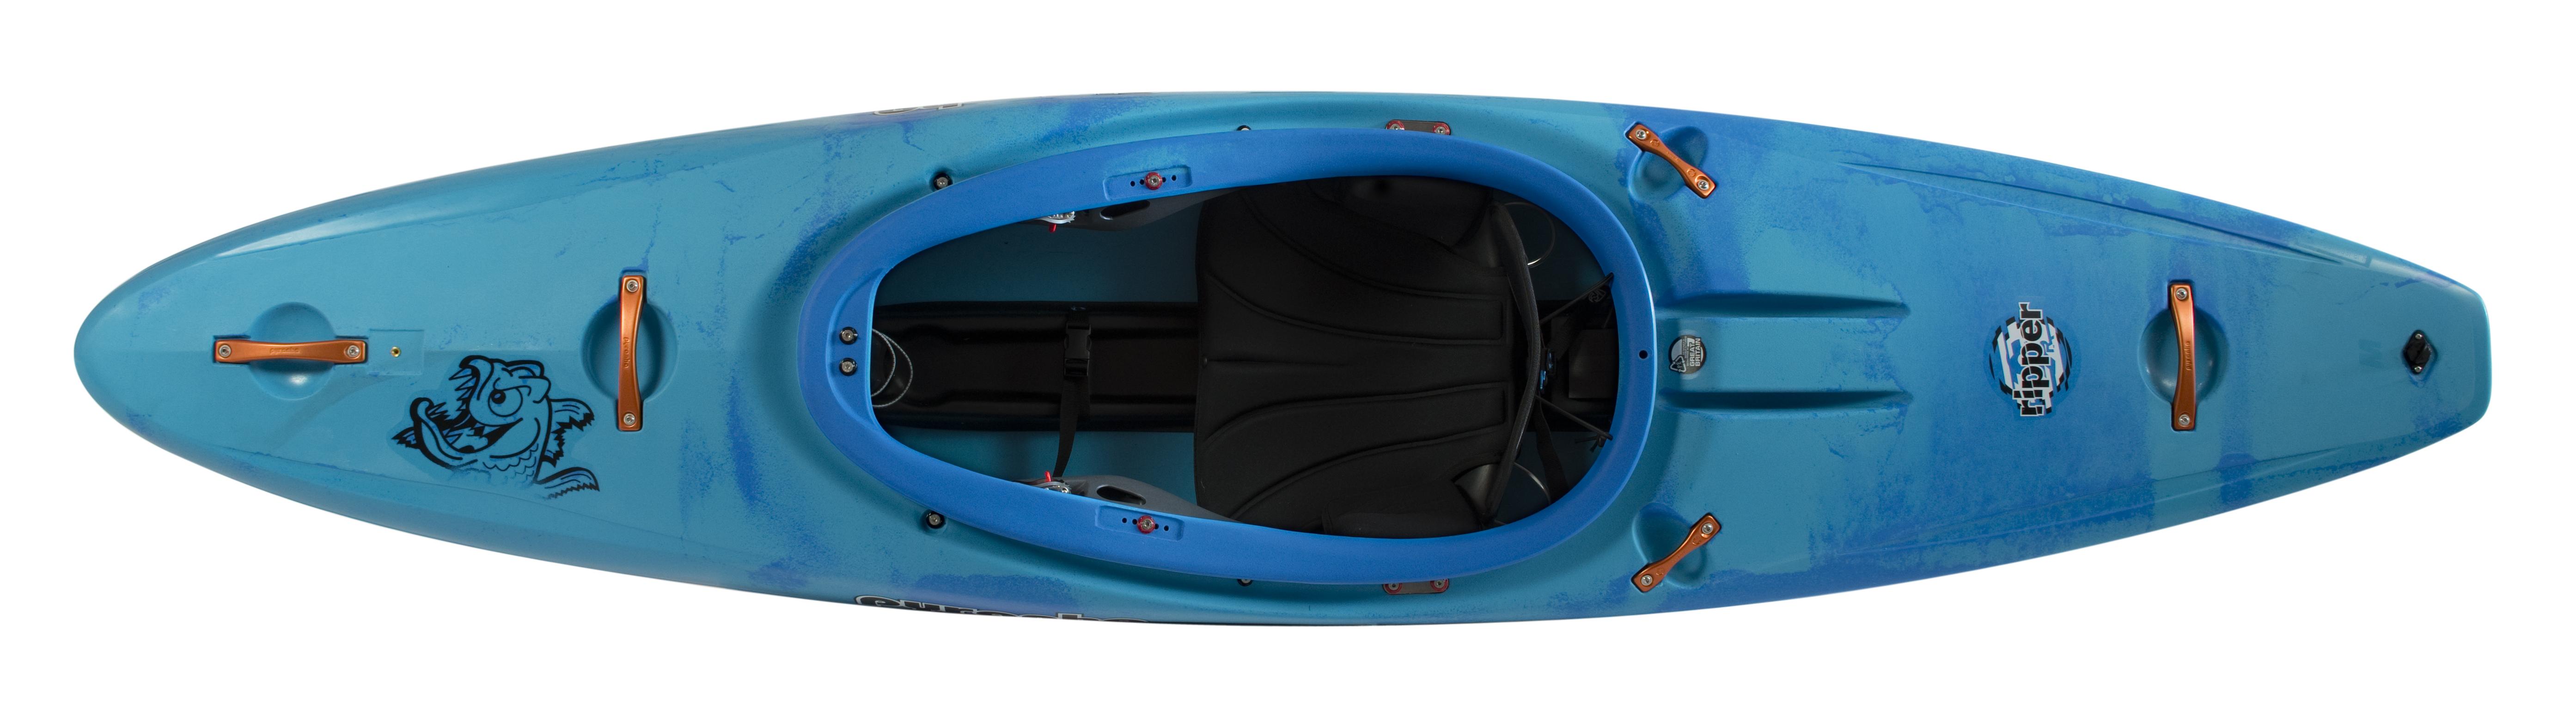 Kayaks: Ripper by Pyranha - Image 2589